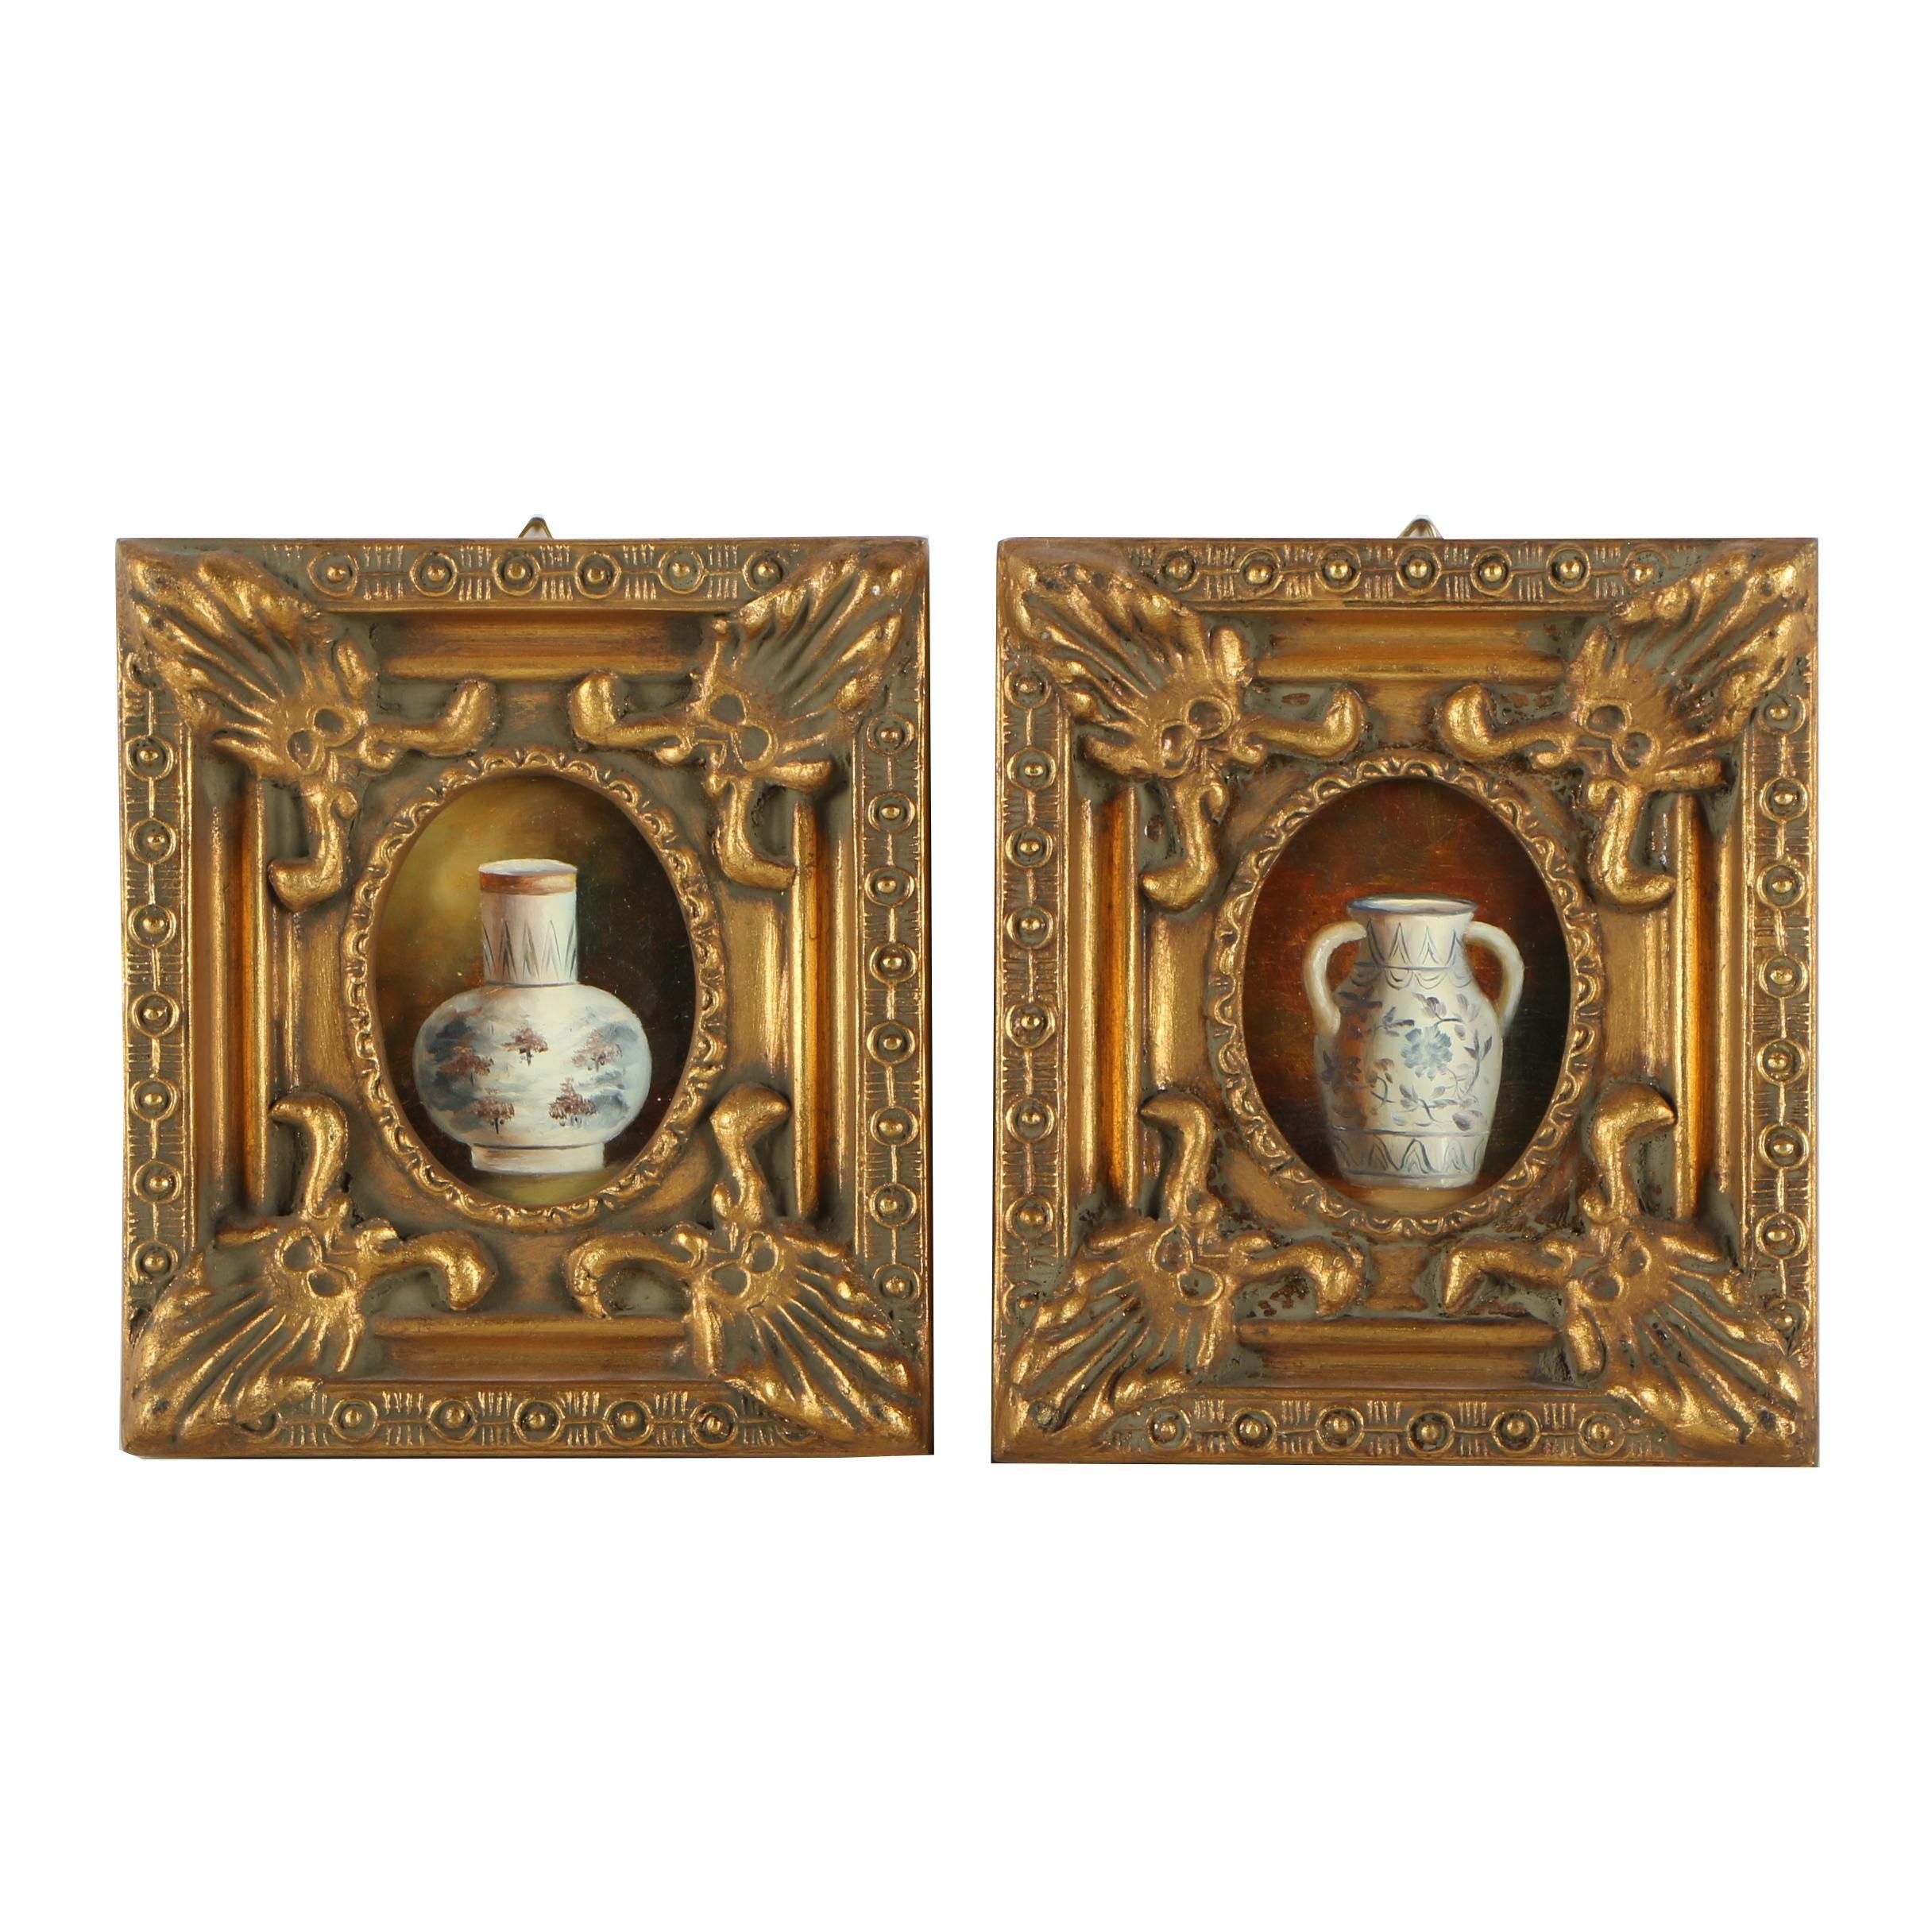 Miniature Oil Paintings of Ceramic Vessels